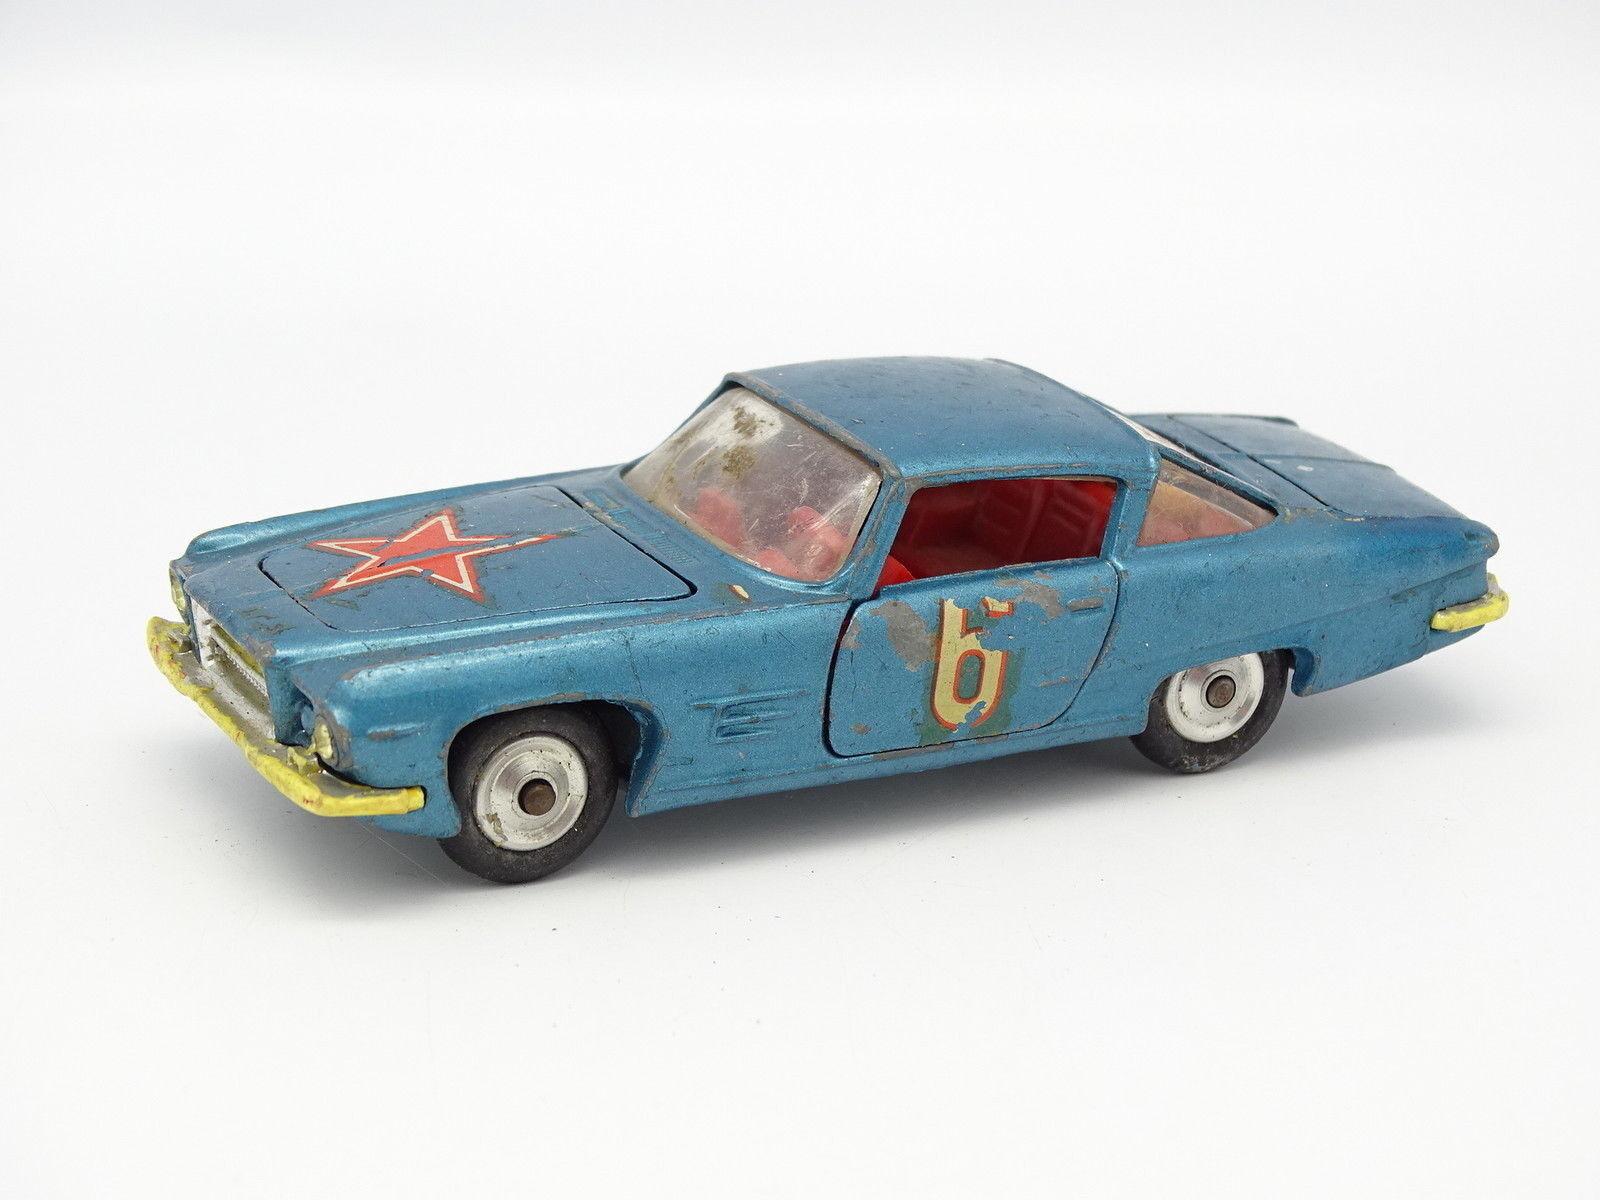 CORGI Spielzeug SB 1 43 - Ghia 6.4l Chrysler Motor blue